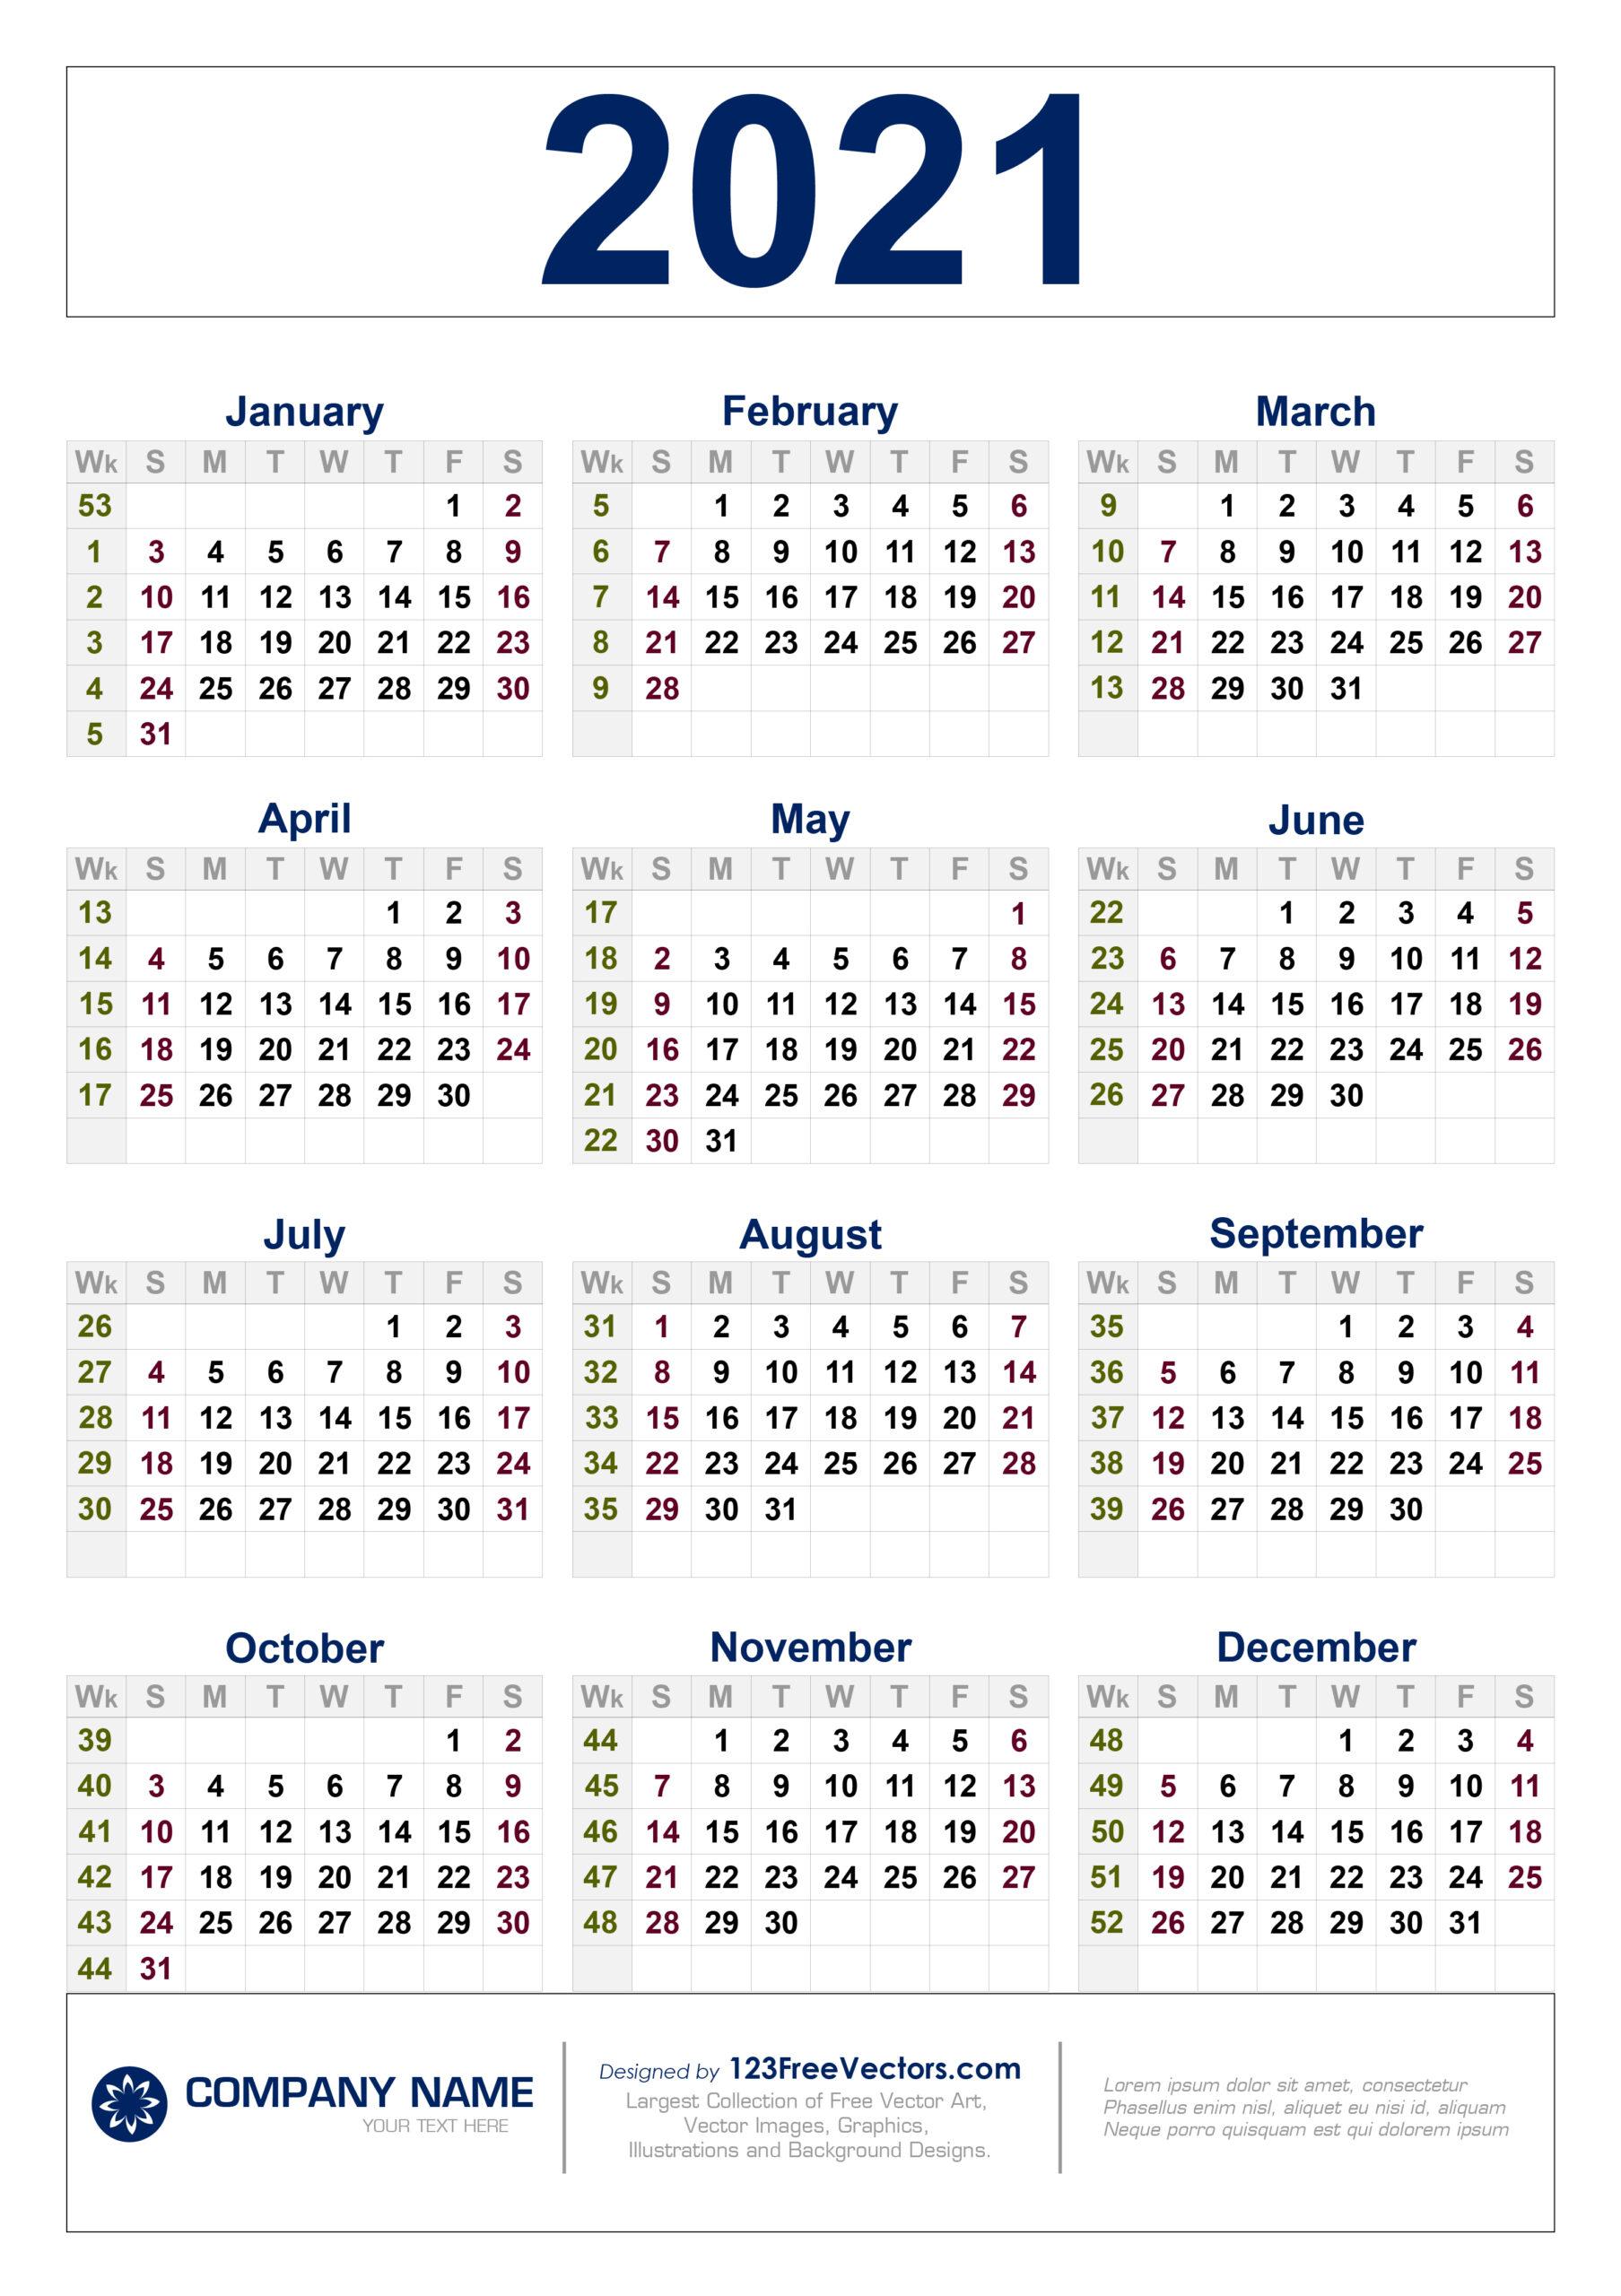 Free Free Download 2021 Calendar With Week Numbers